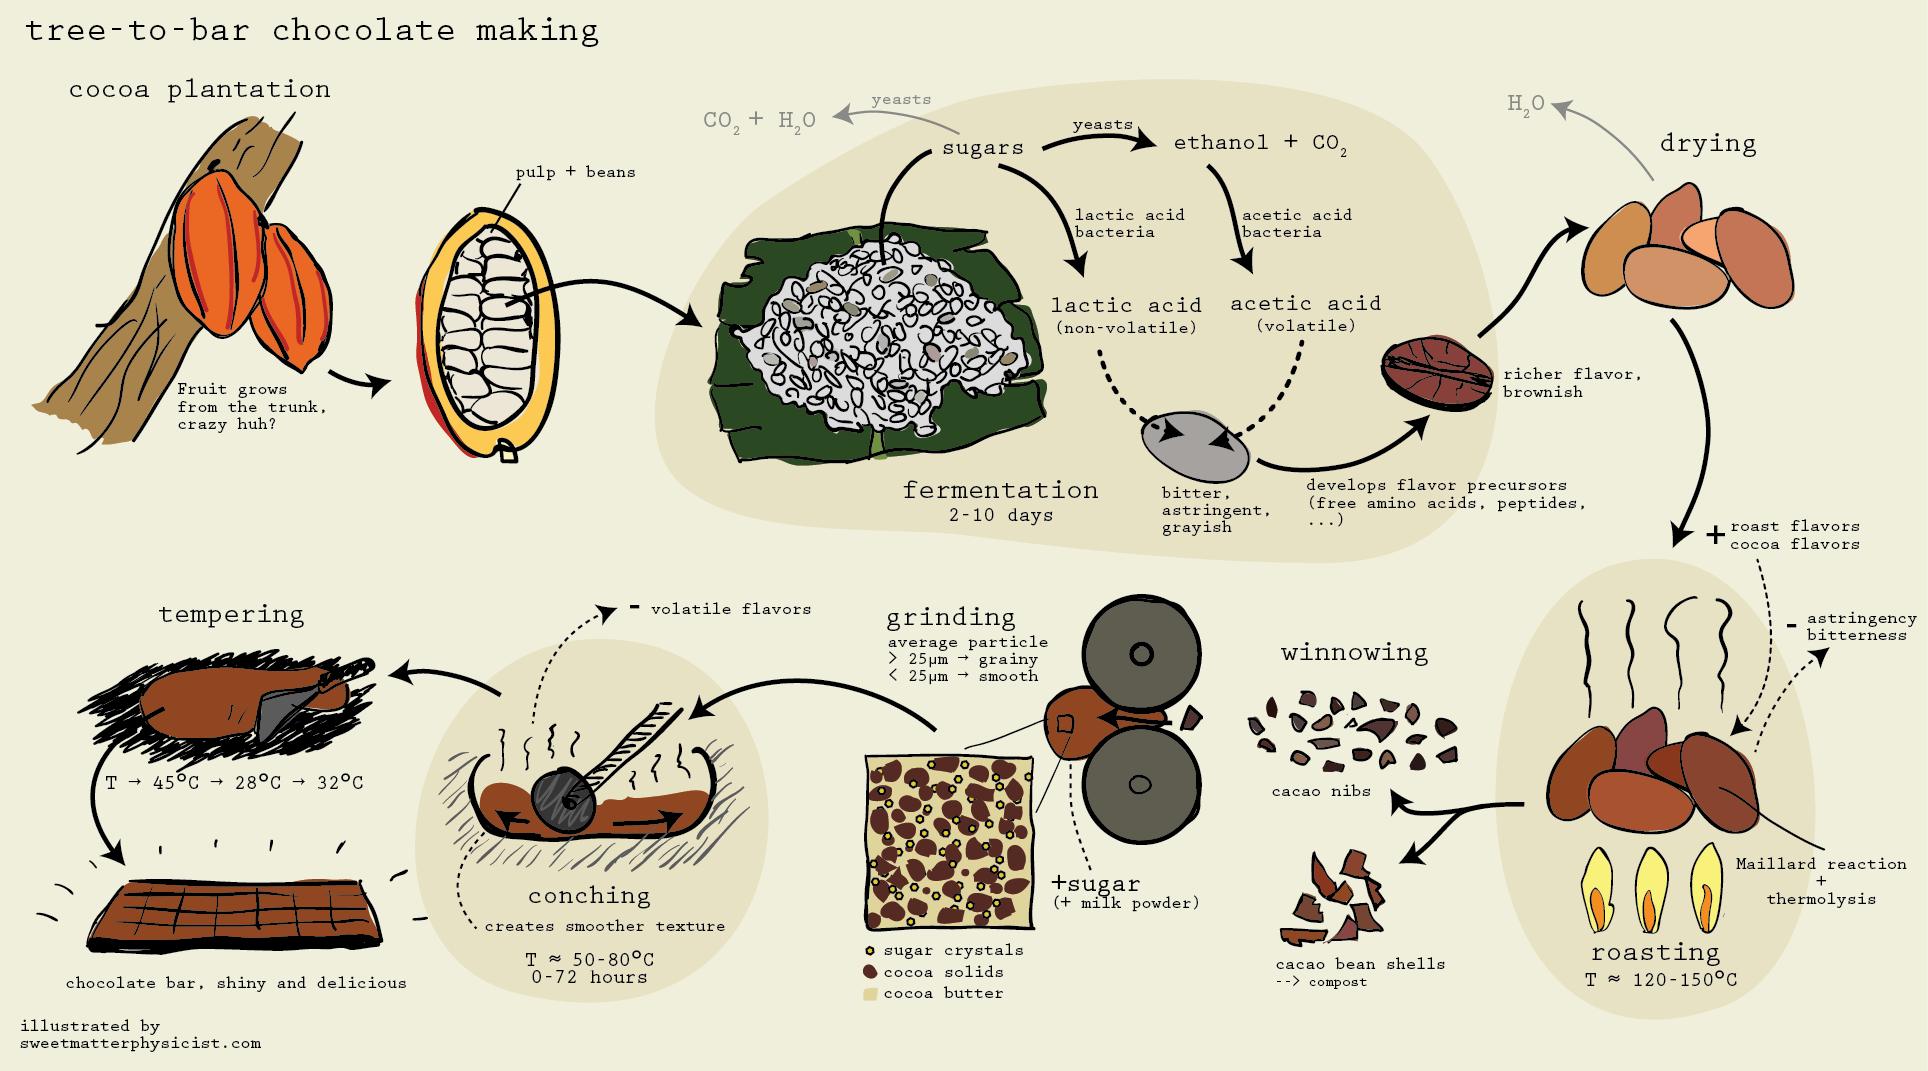 Chocolate Manufacture Porcess